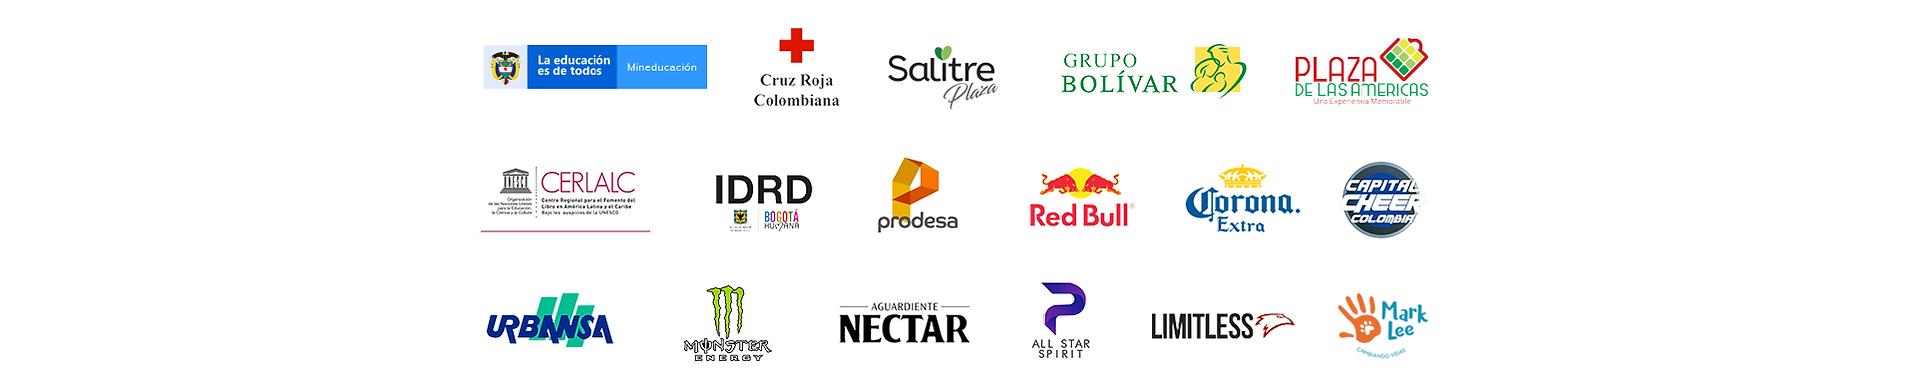 logos-clientes-2021.png